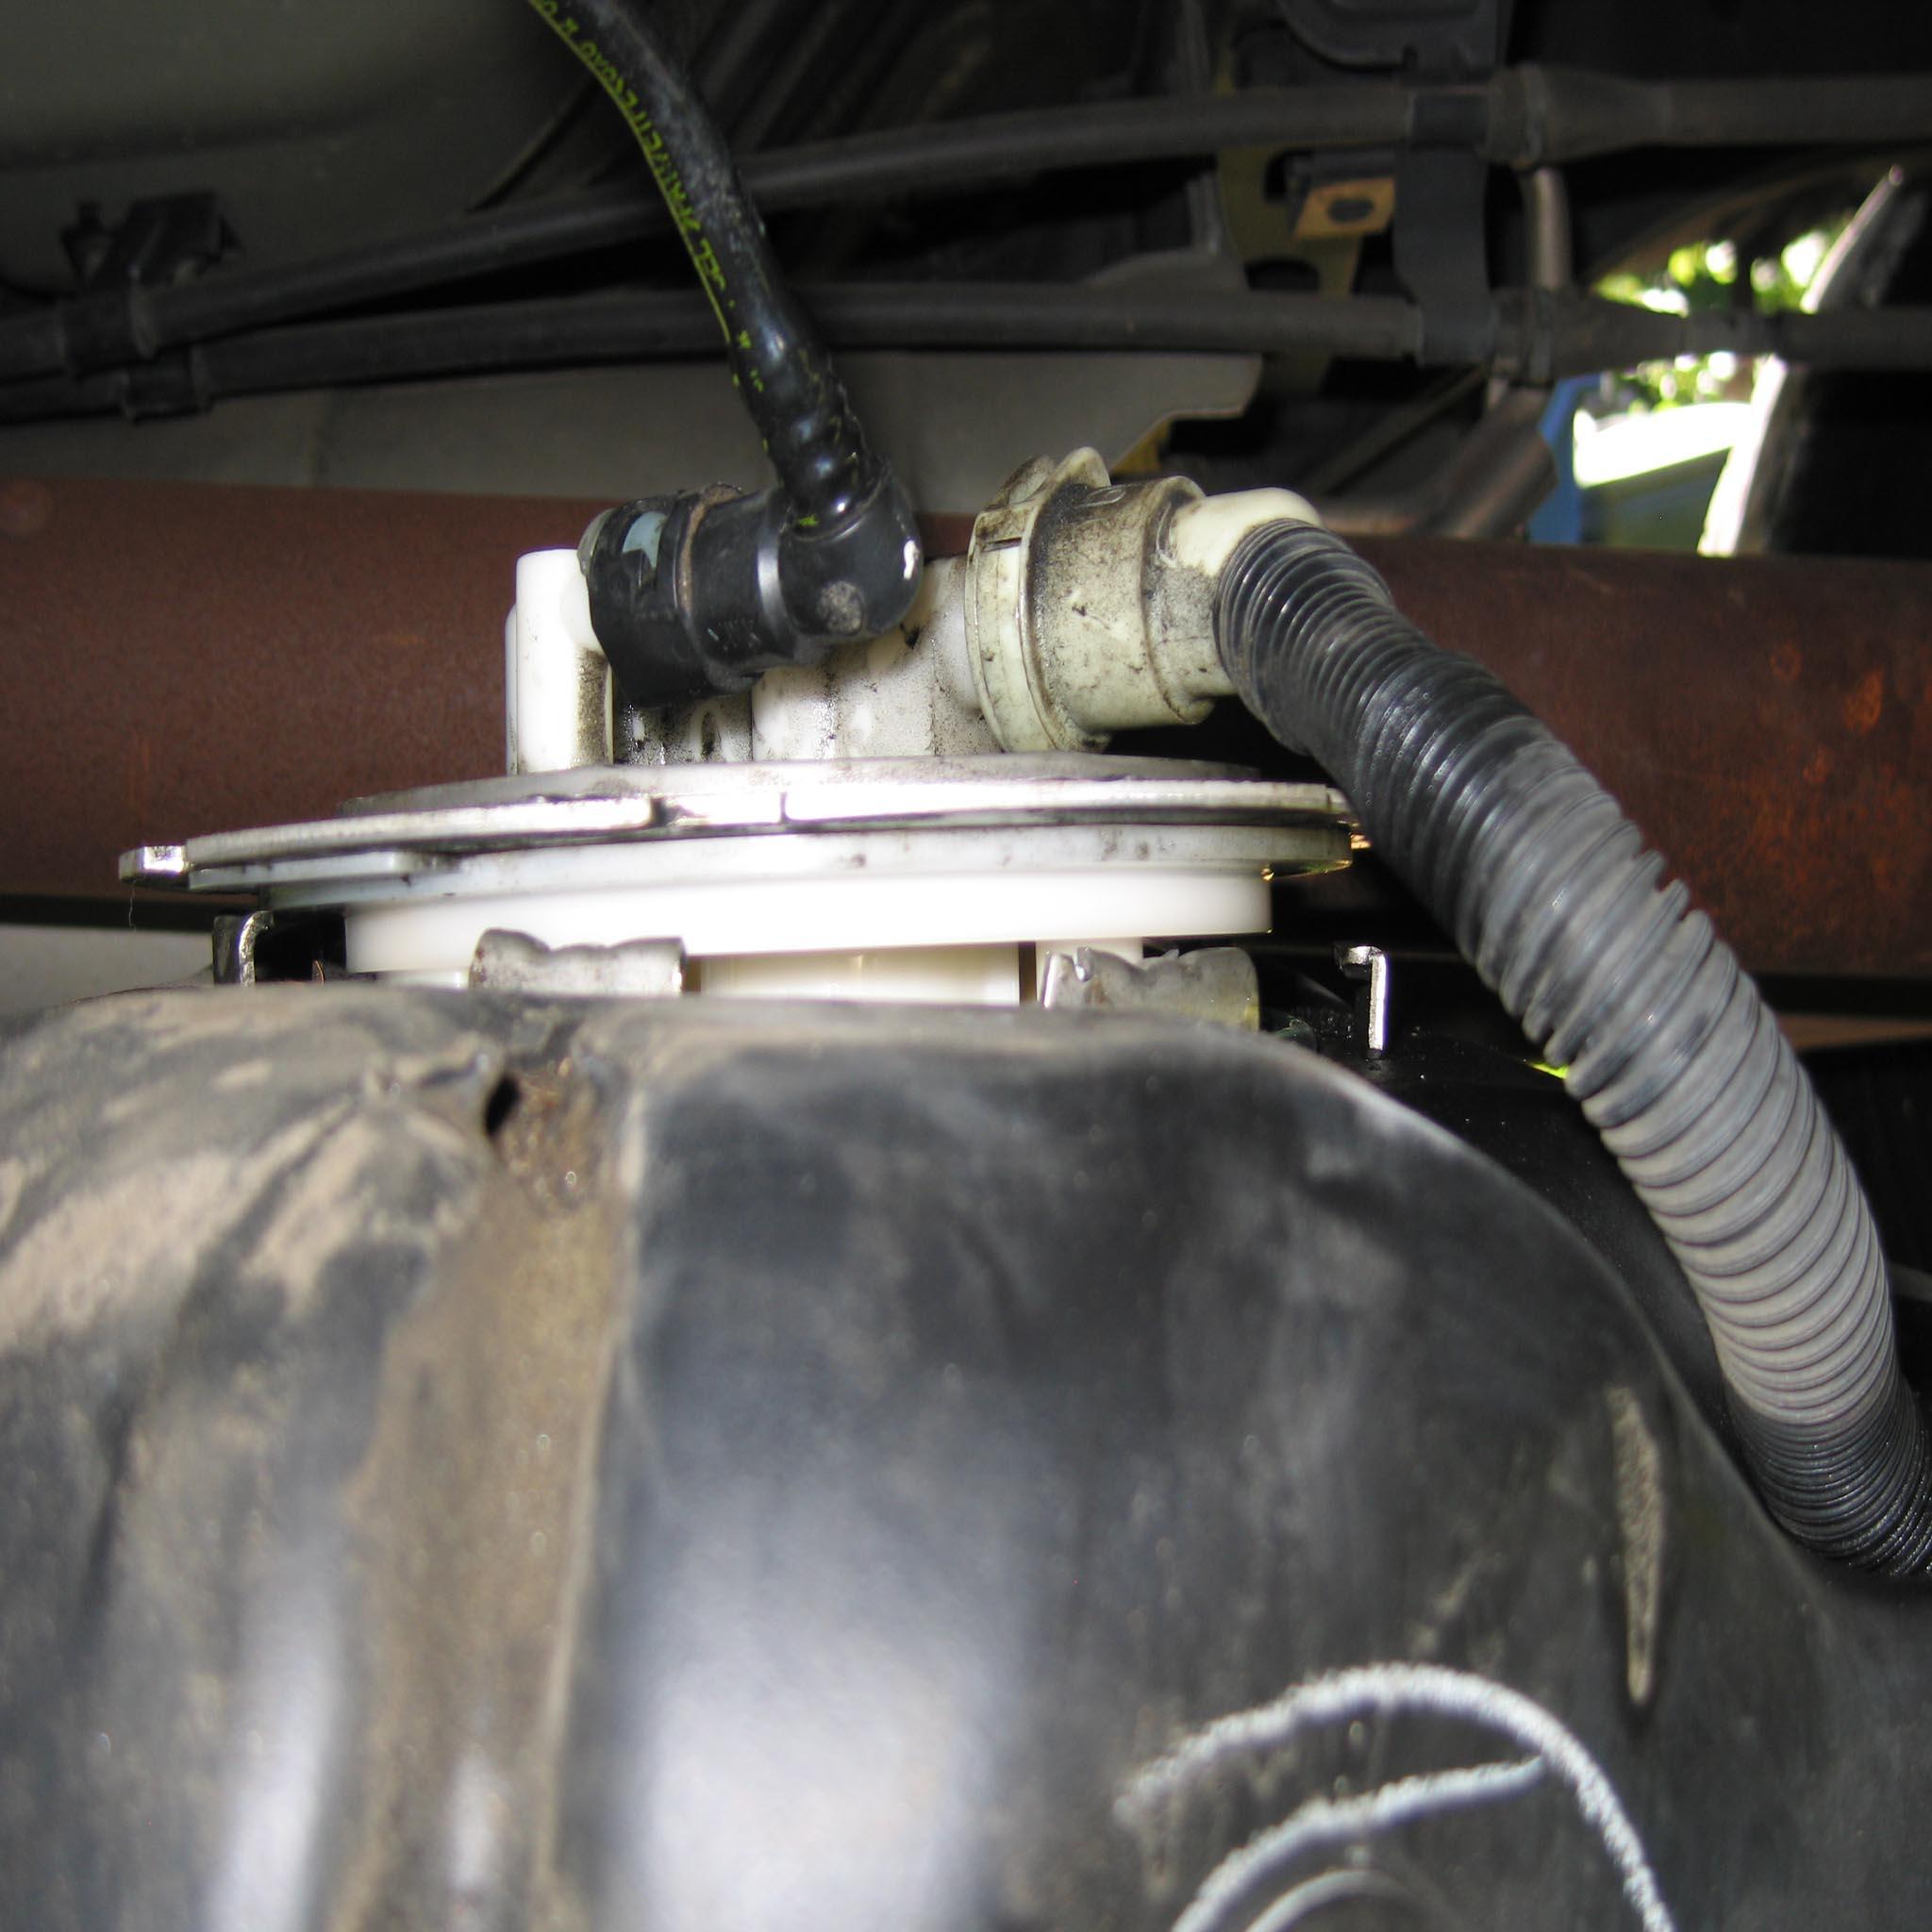 2005 Nissan Frontier Fuel Filter Location